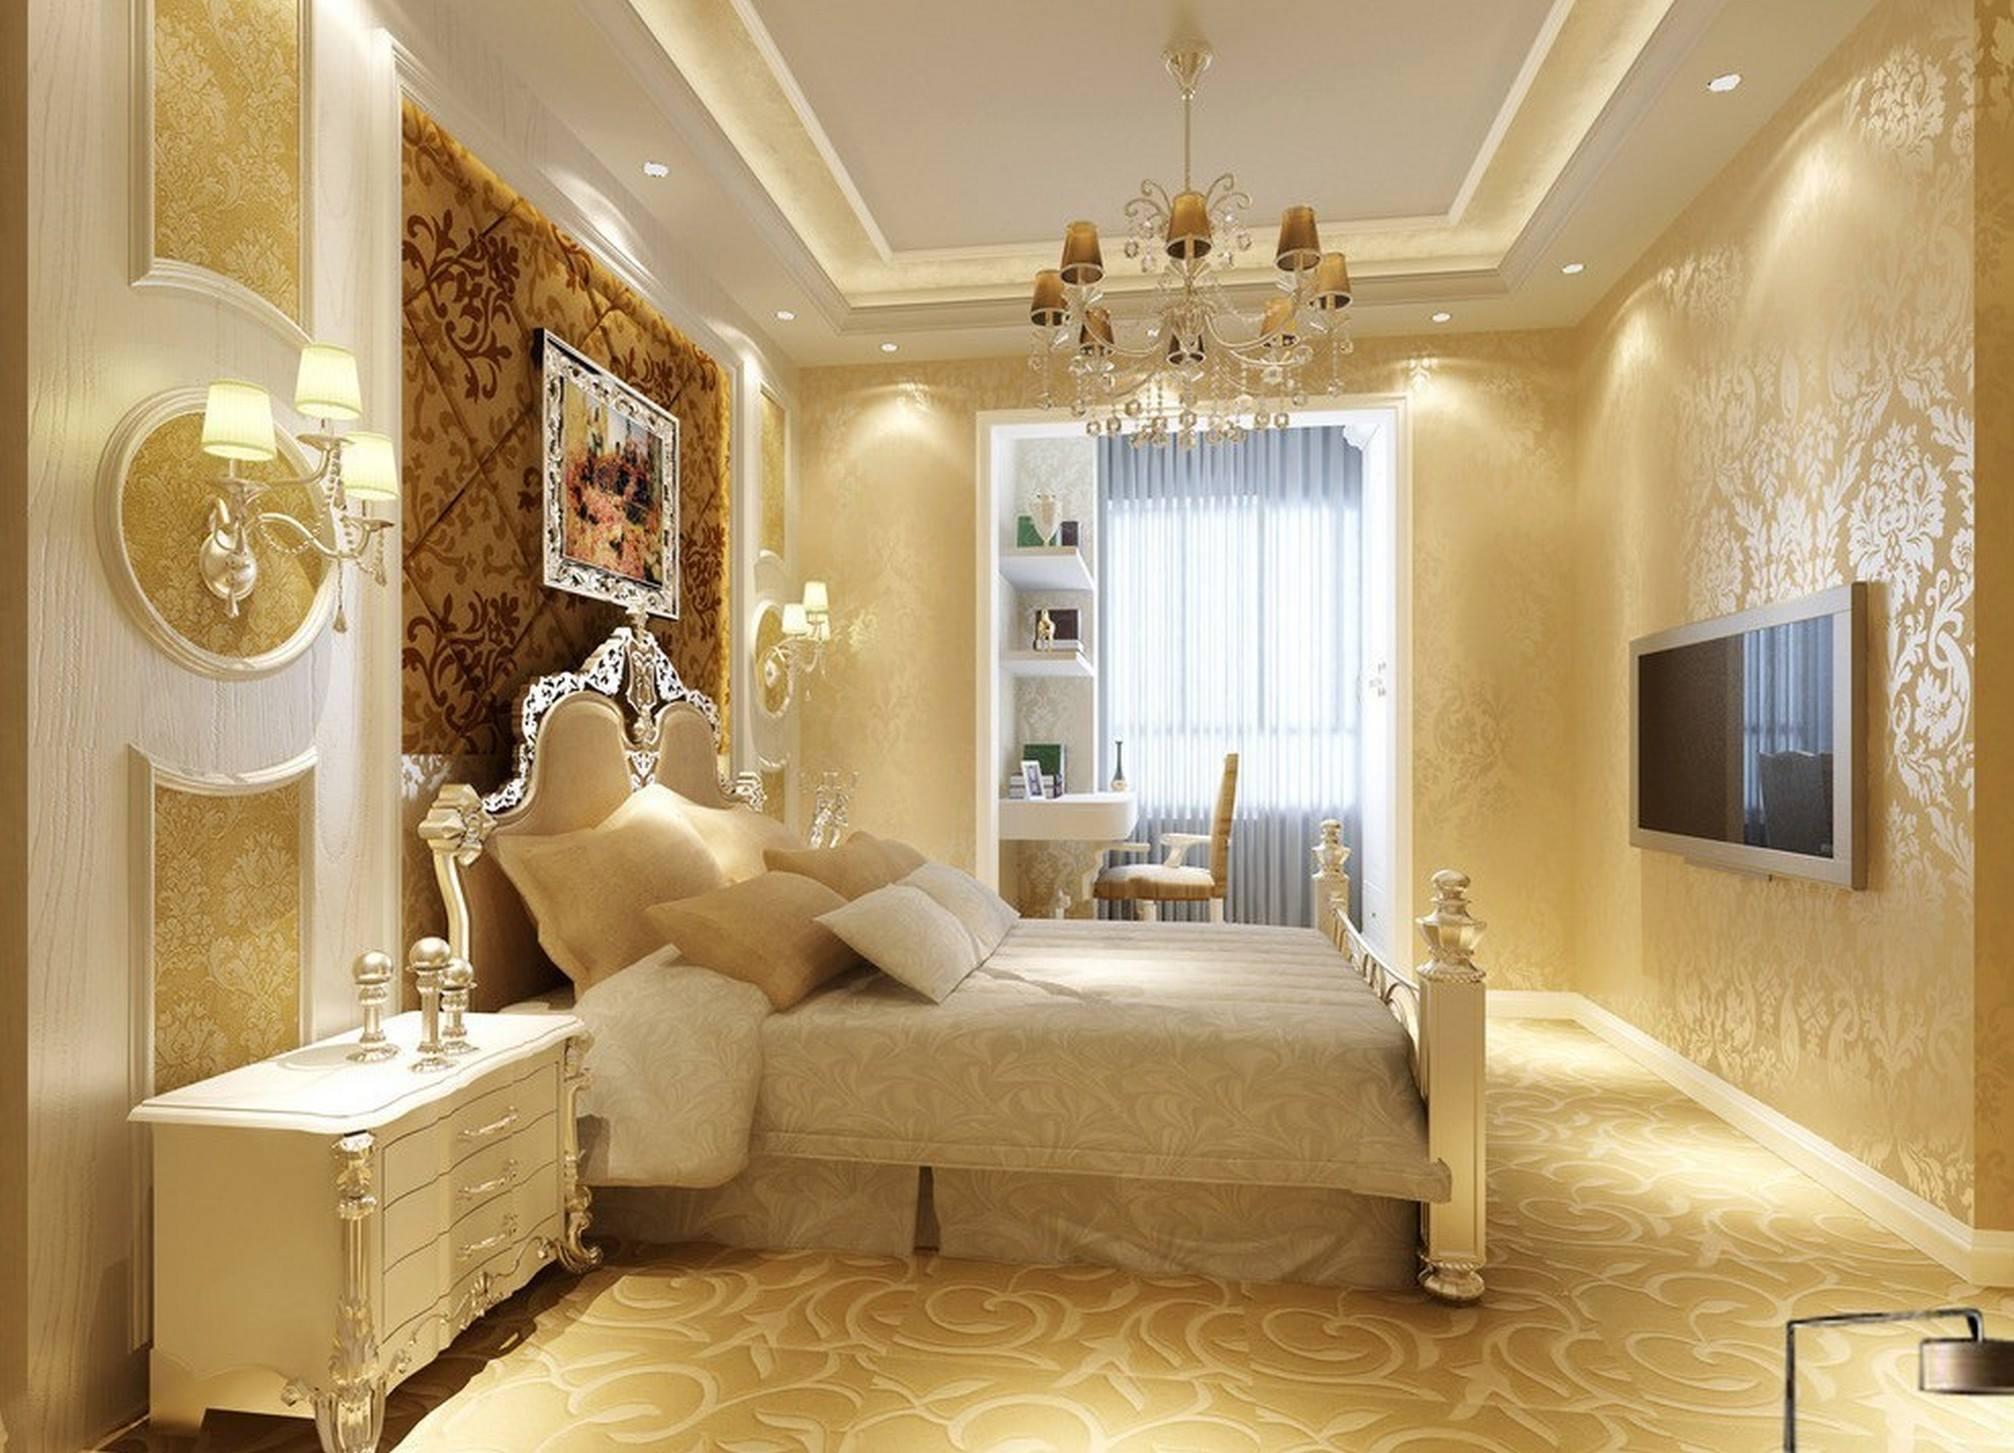 صوره ديكورات جبس غرف نوم , ديكور غرفة نوم يجنن